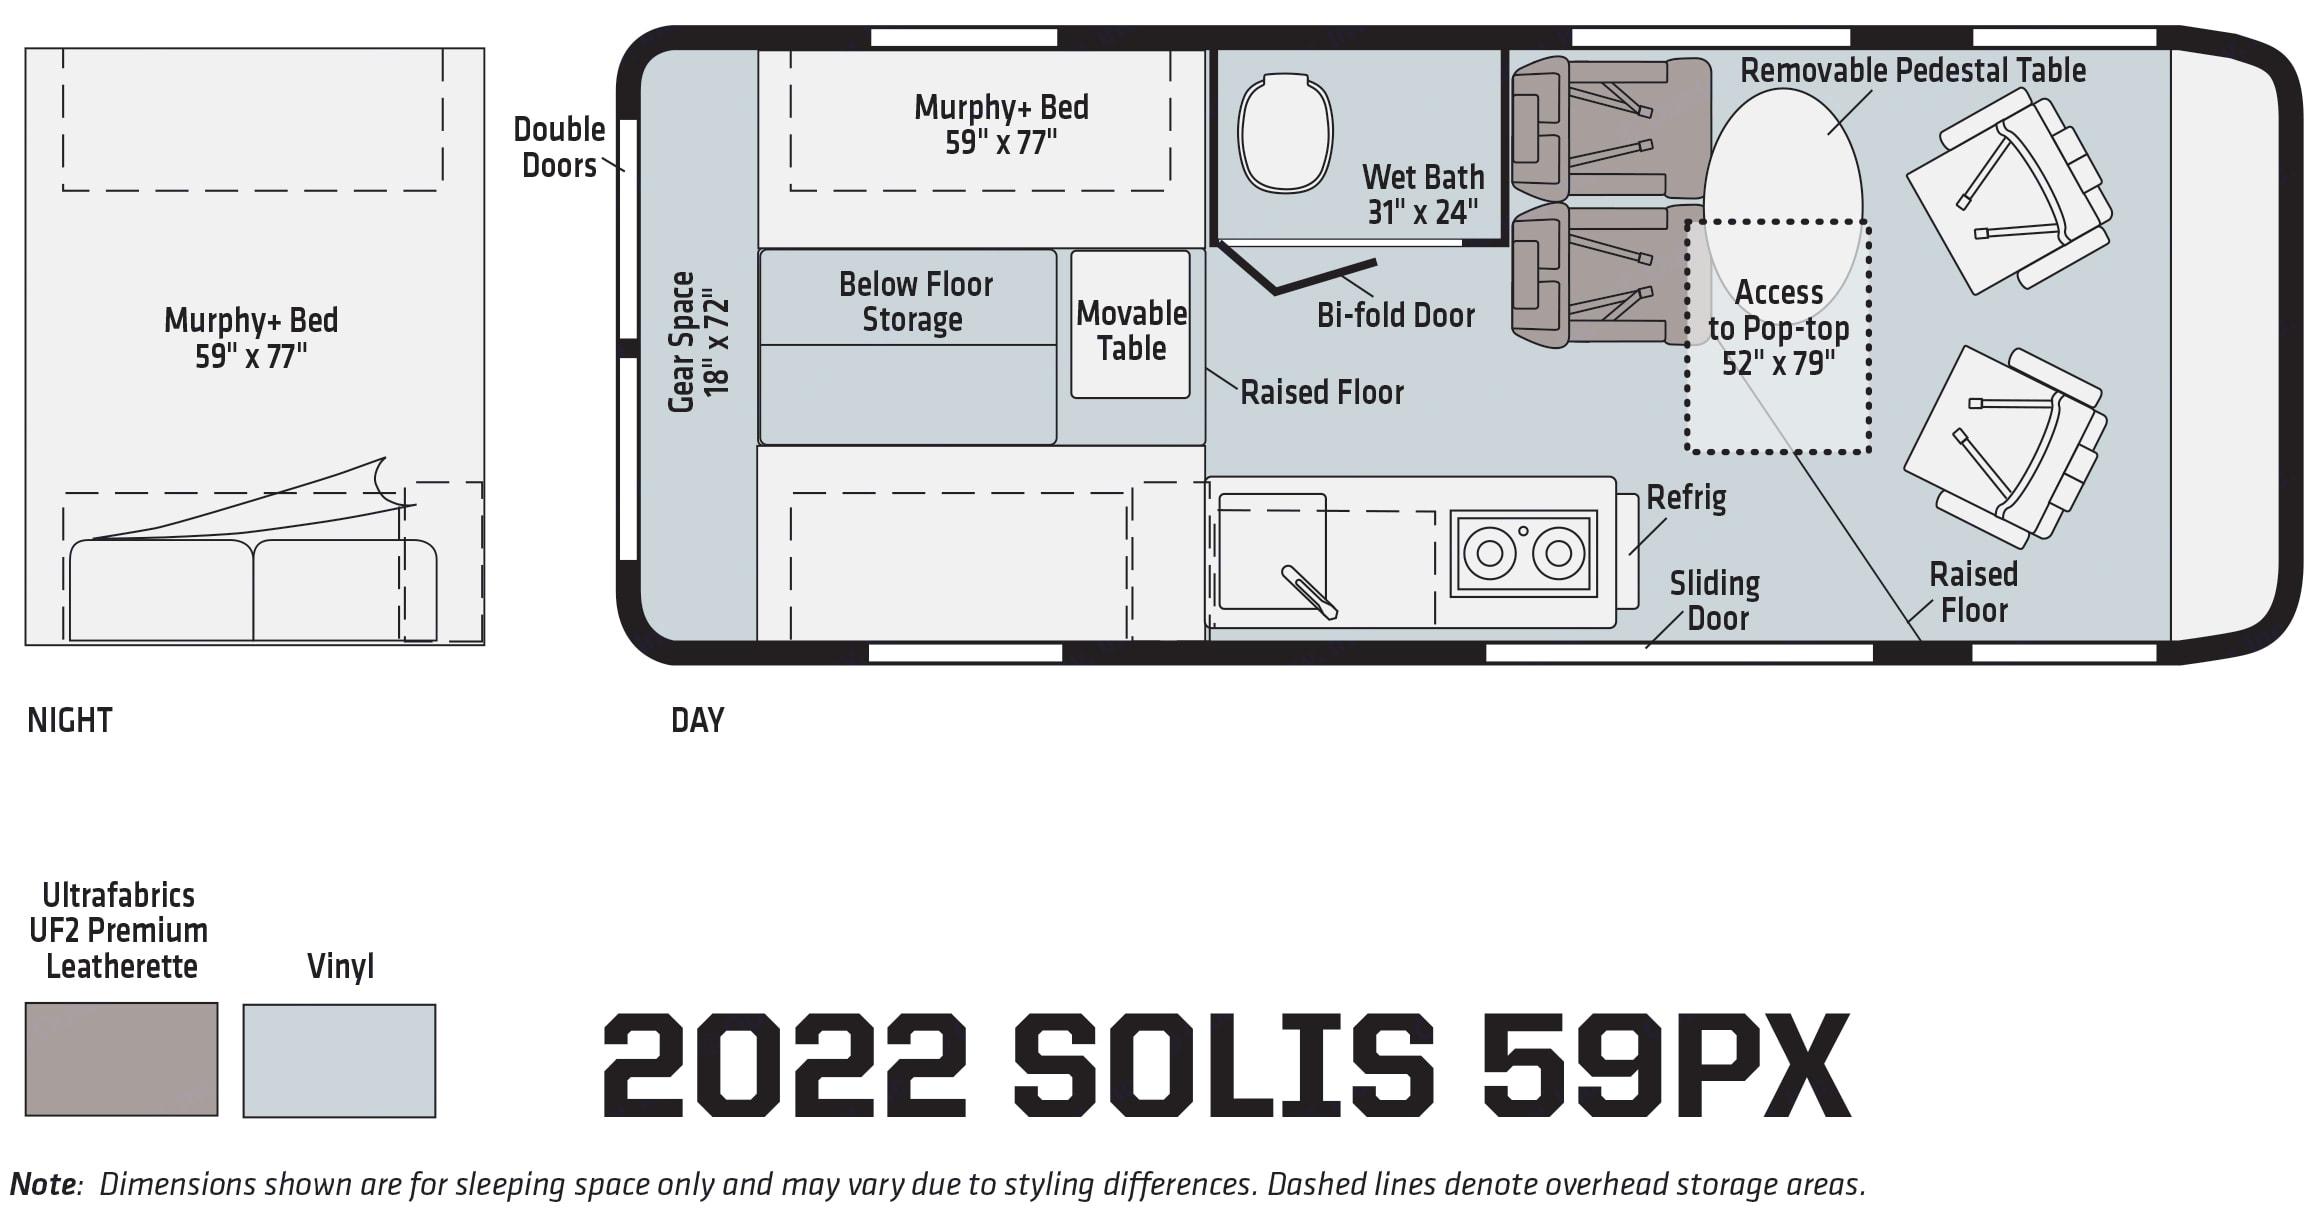 Winnebago Solis PX 2022